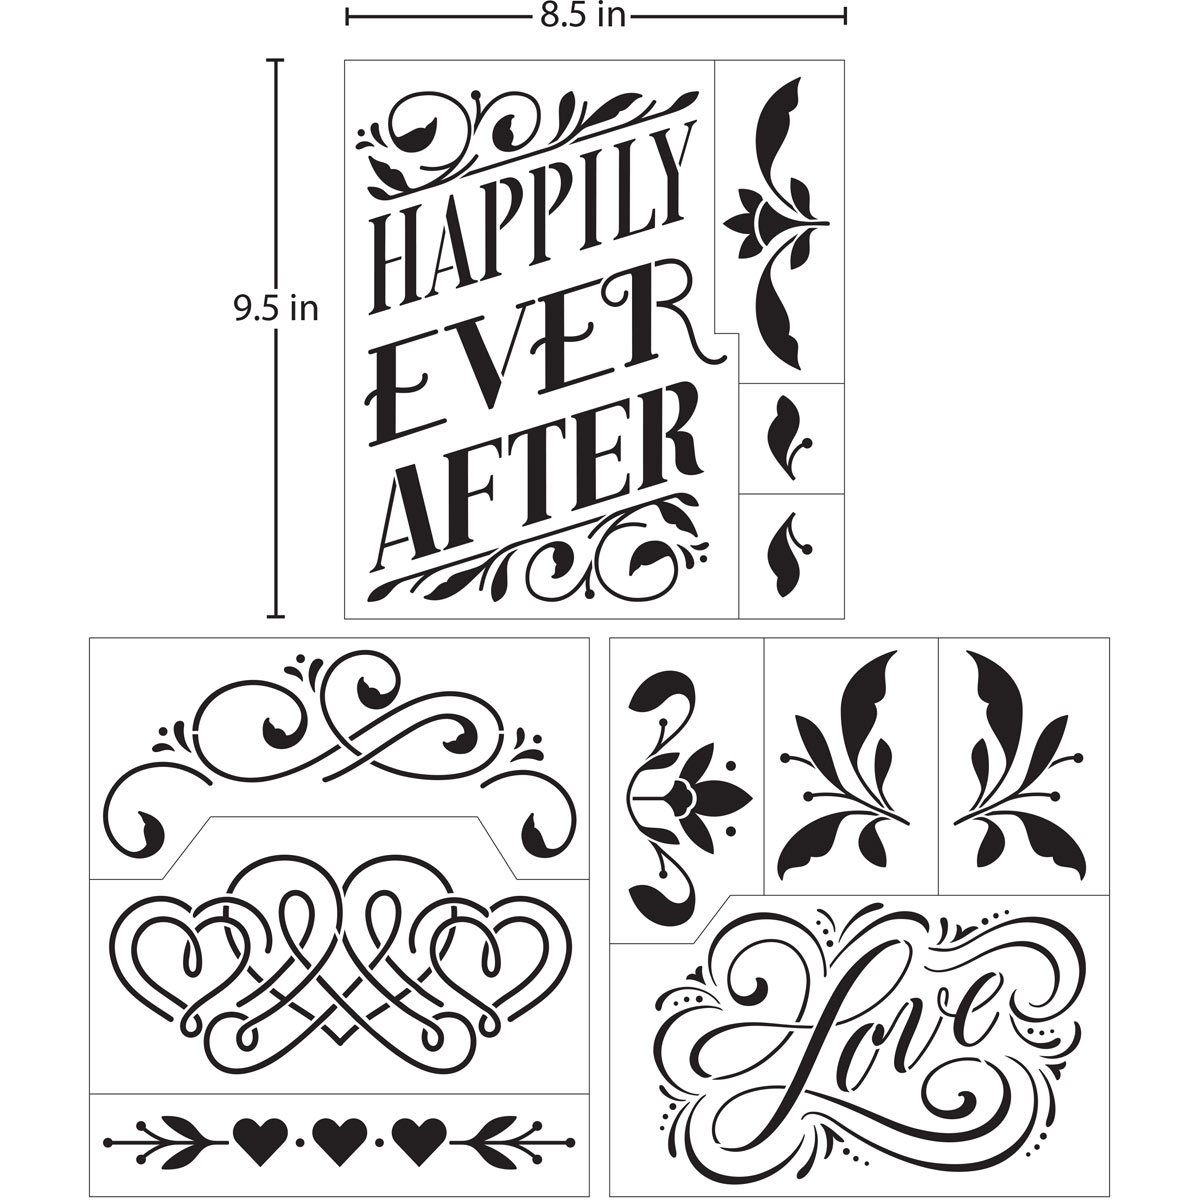 Hallmark Handcrafted Adhesive Stencils - Elegancia Design Pack, 8-1/2